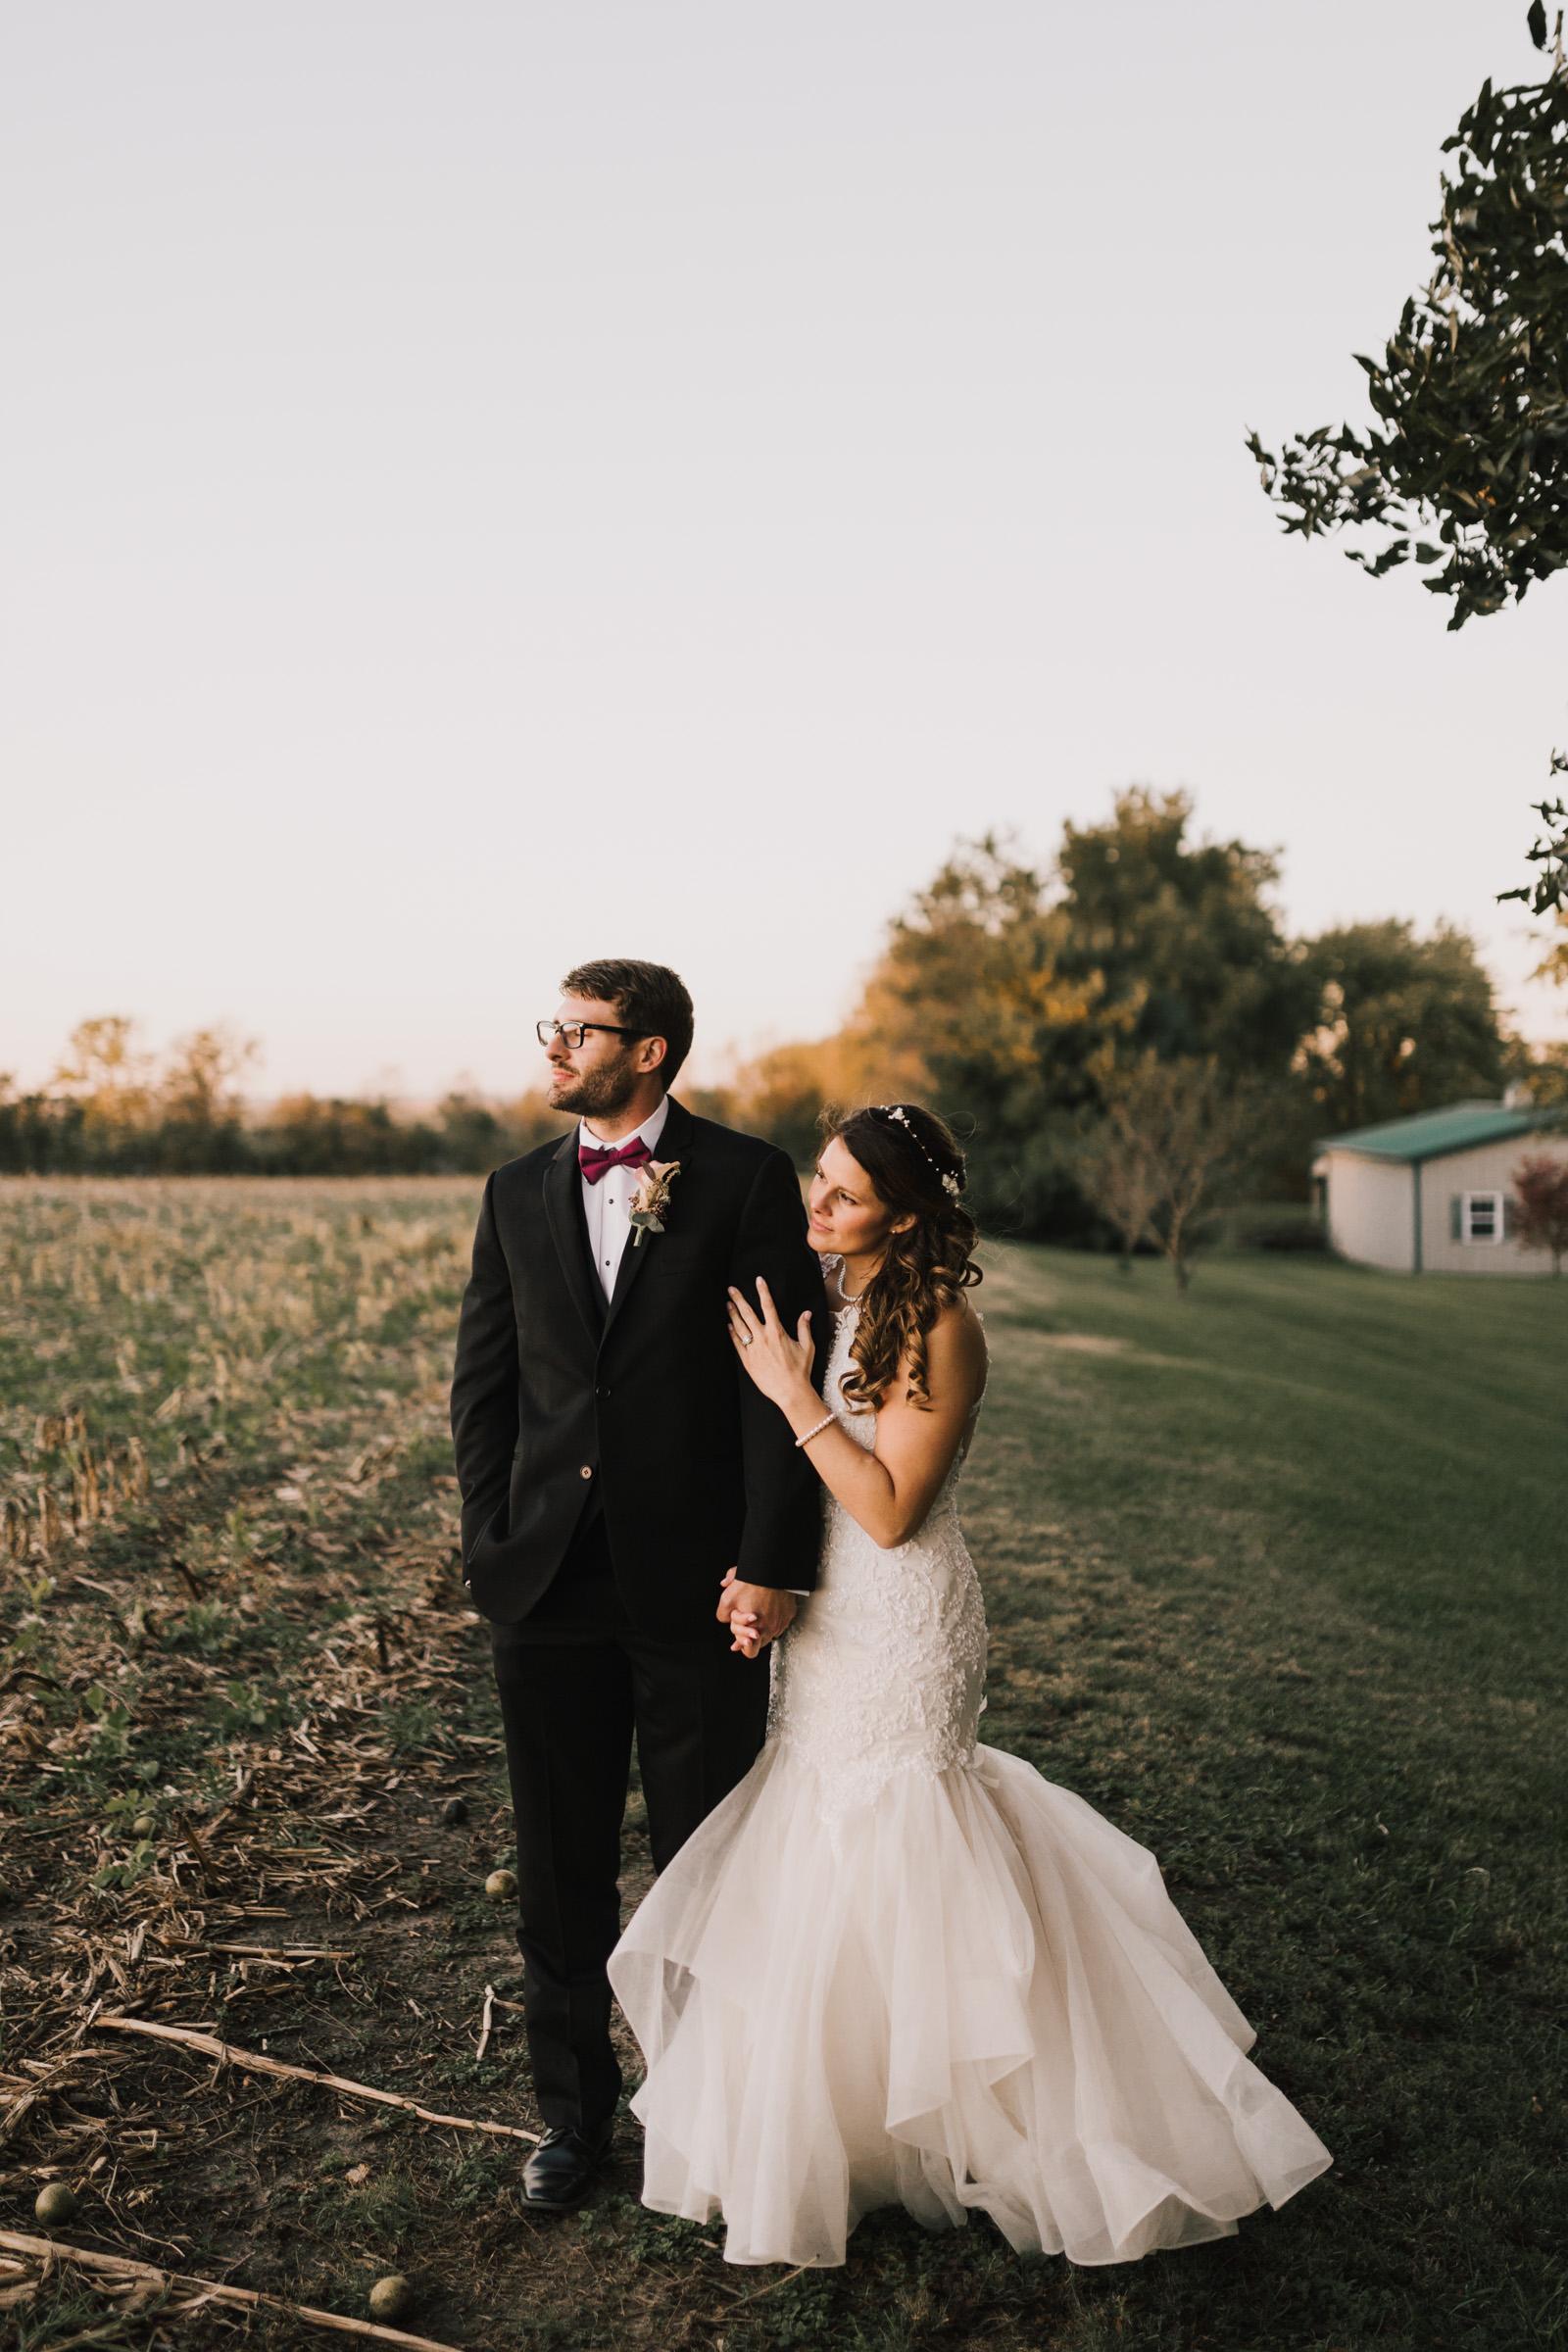 alyssa barletter photography intimate fall autumn wedding rural missouri wedding photographer-37.jpg